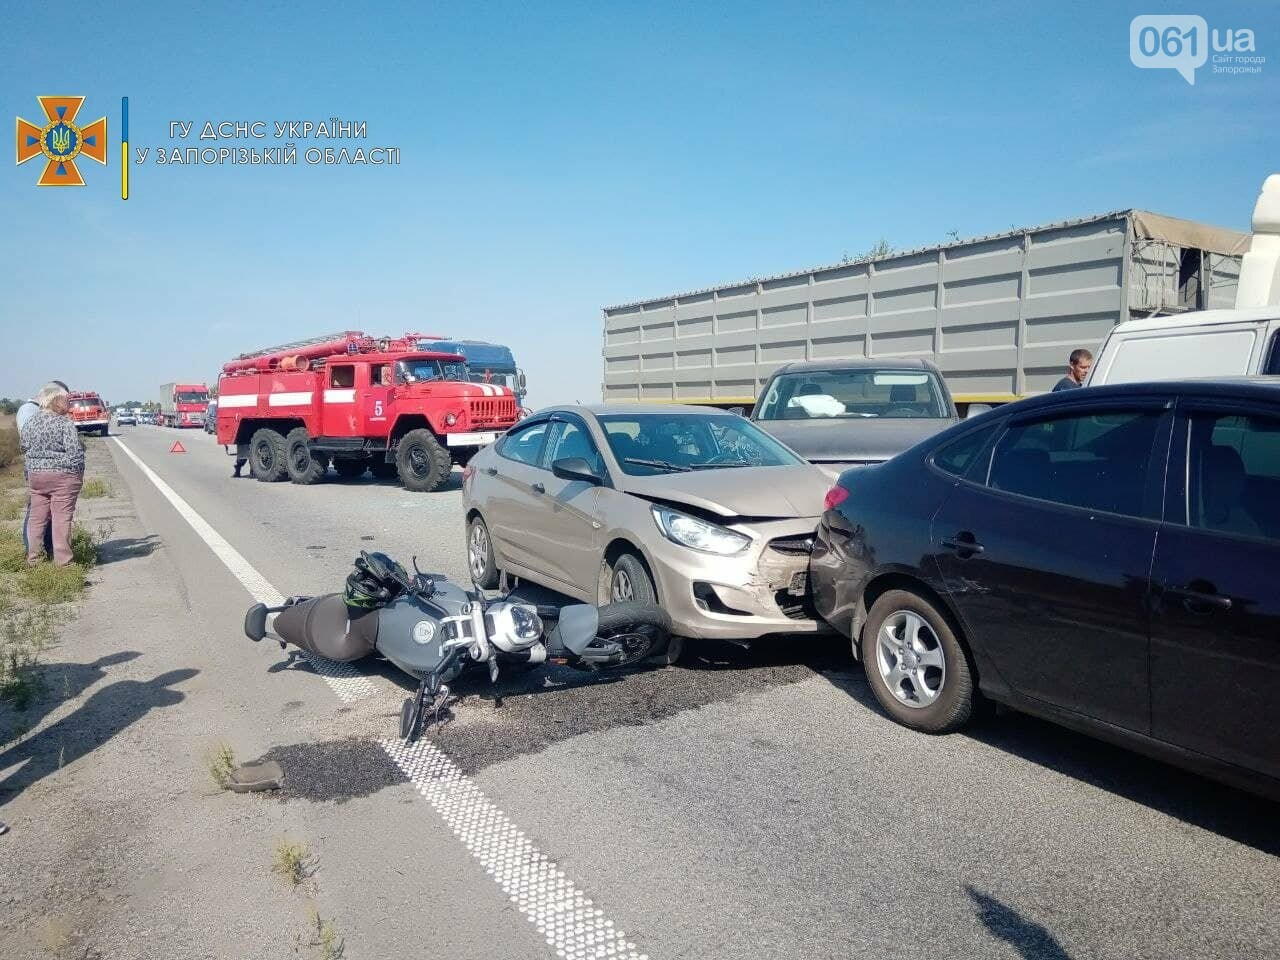 photo2021 09 1714 11 06result 61459dd9b1e96 - На запорожской трассе из-за дыма от пожара столкнулись пять автомобилей